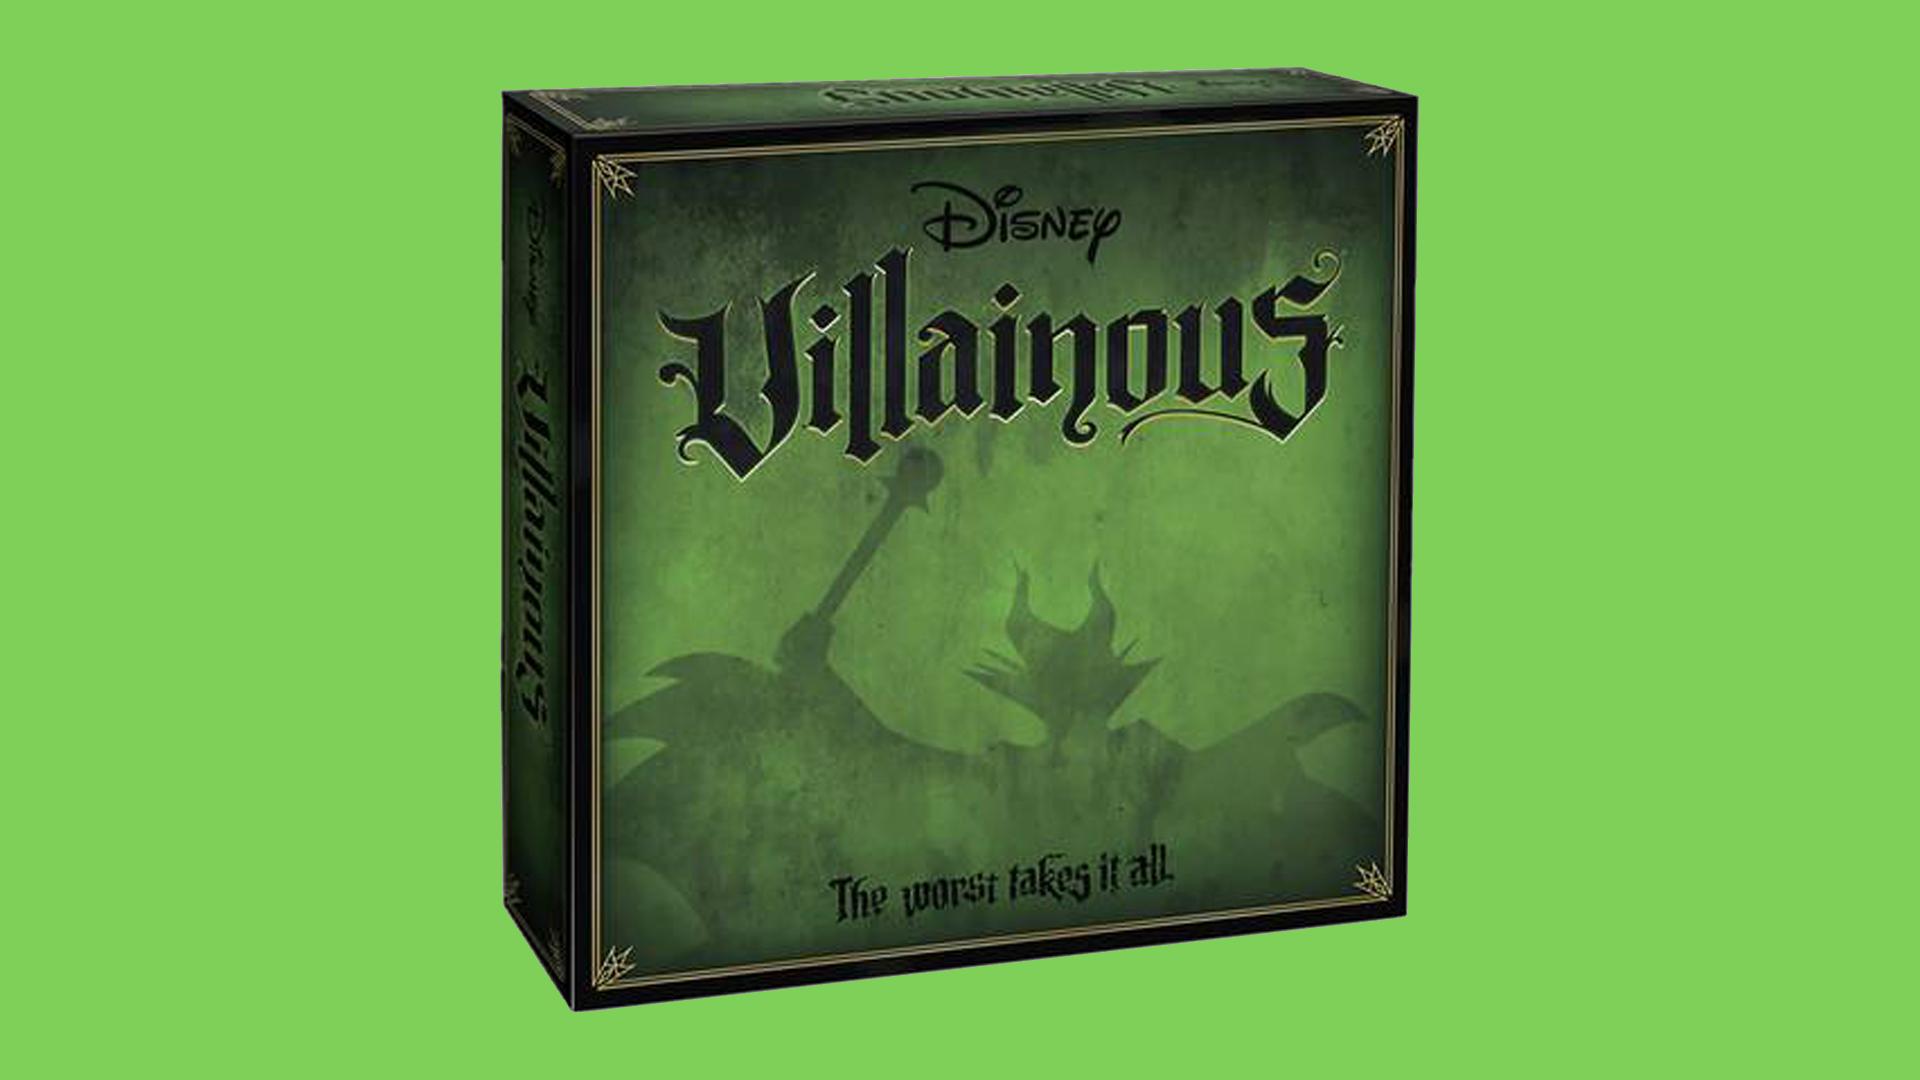 Villainous_board_game_Disney.png